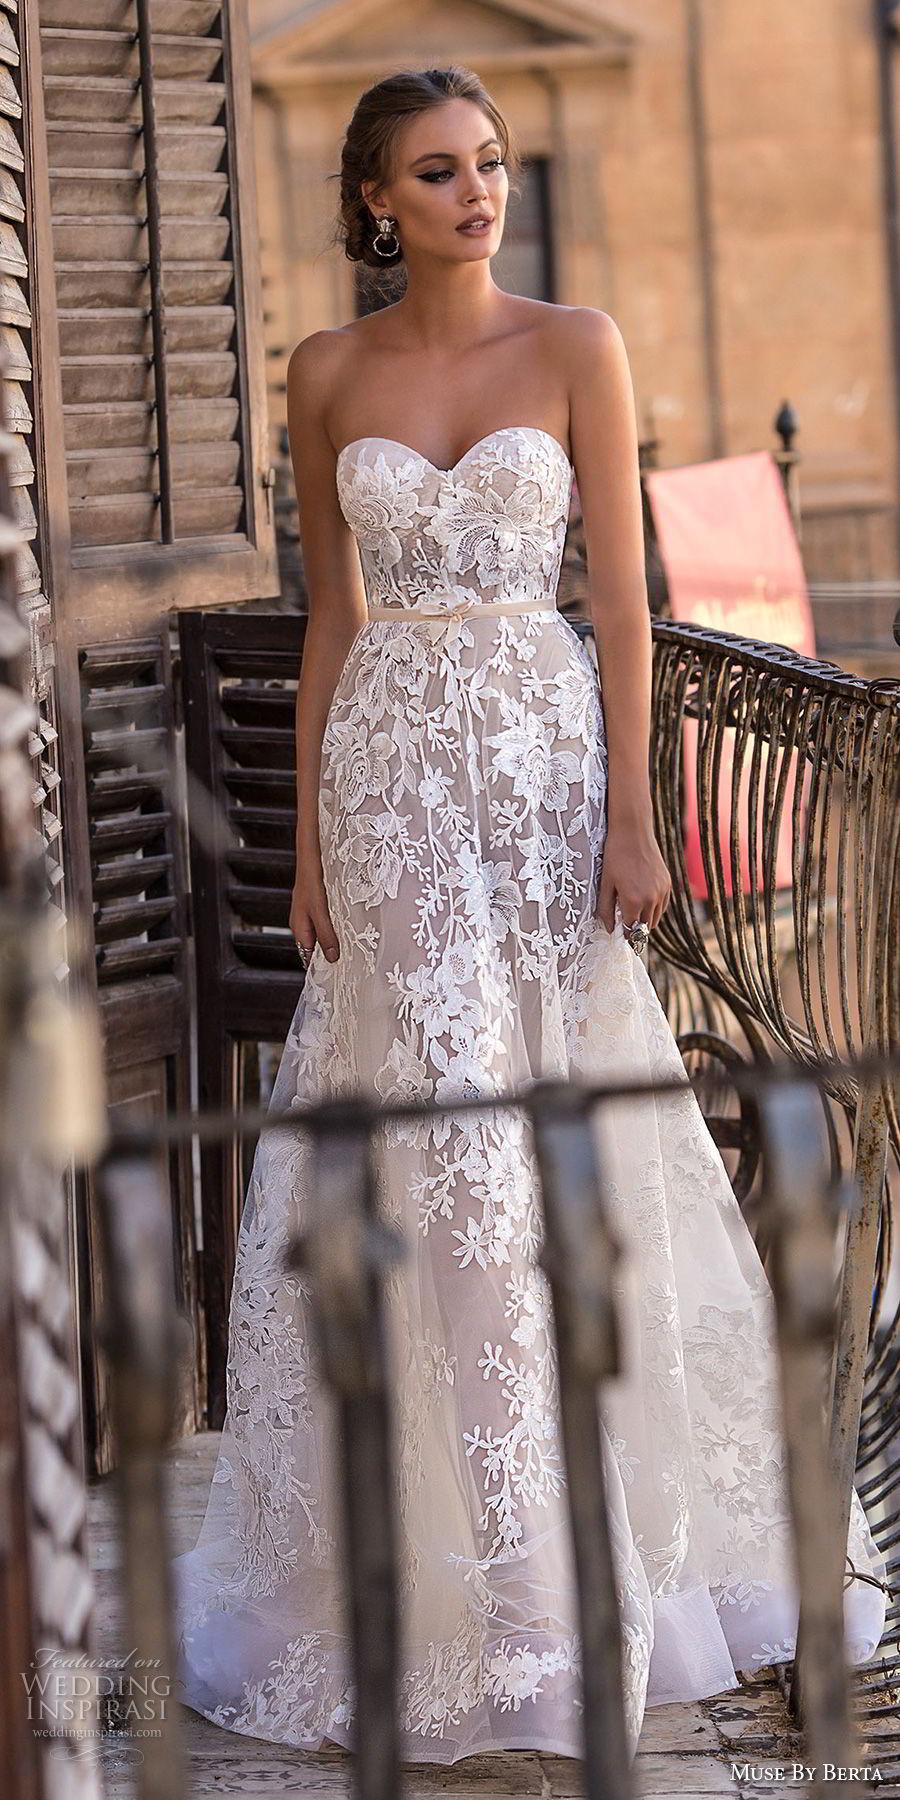 muse-berta-2018-bridal-strapless-sweetheart-neckline-full-embellishment-romantic-a-line-wedding-dress-medium-train-11-mv